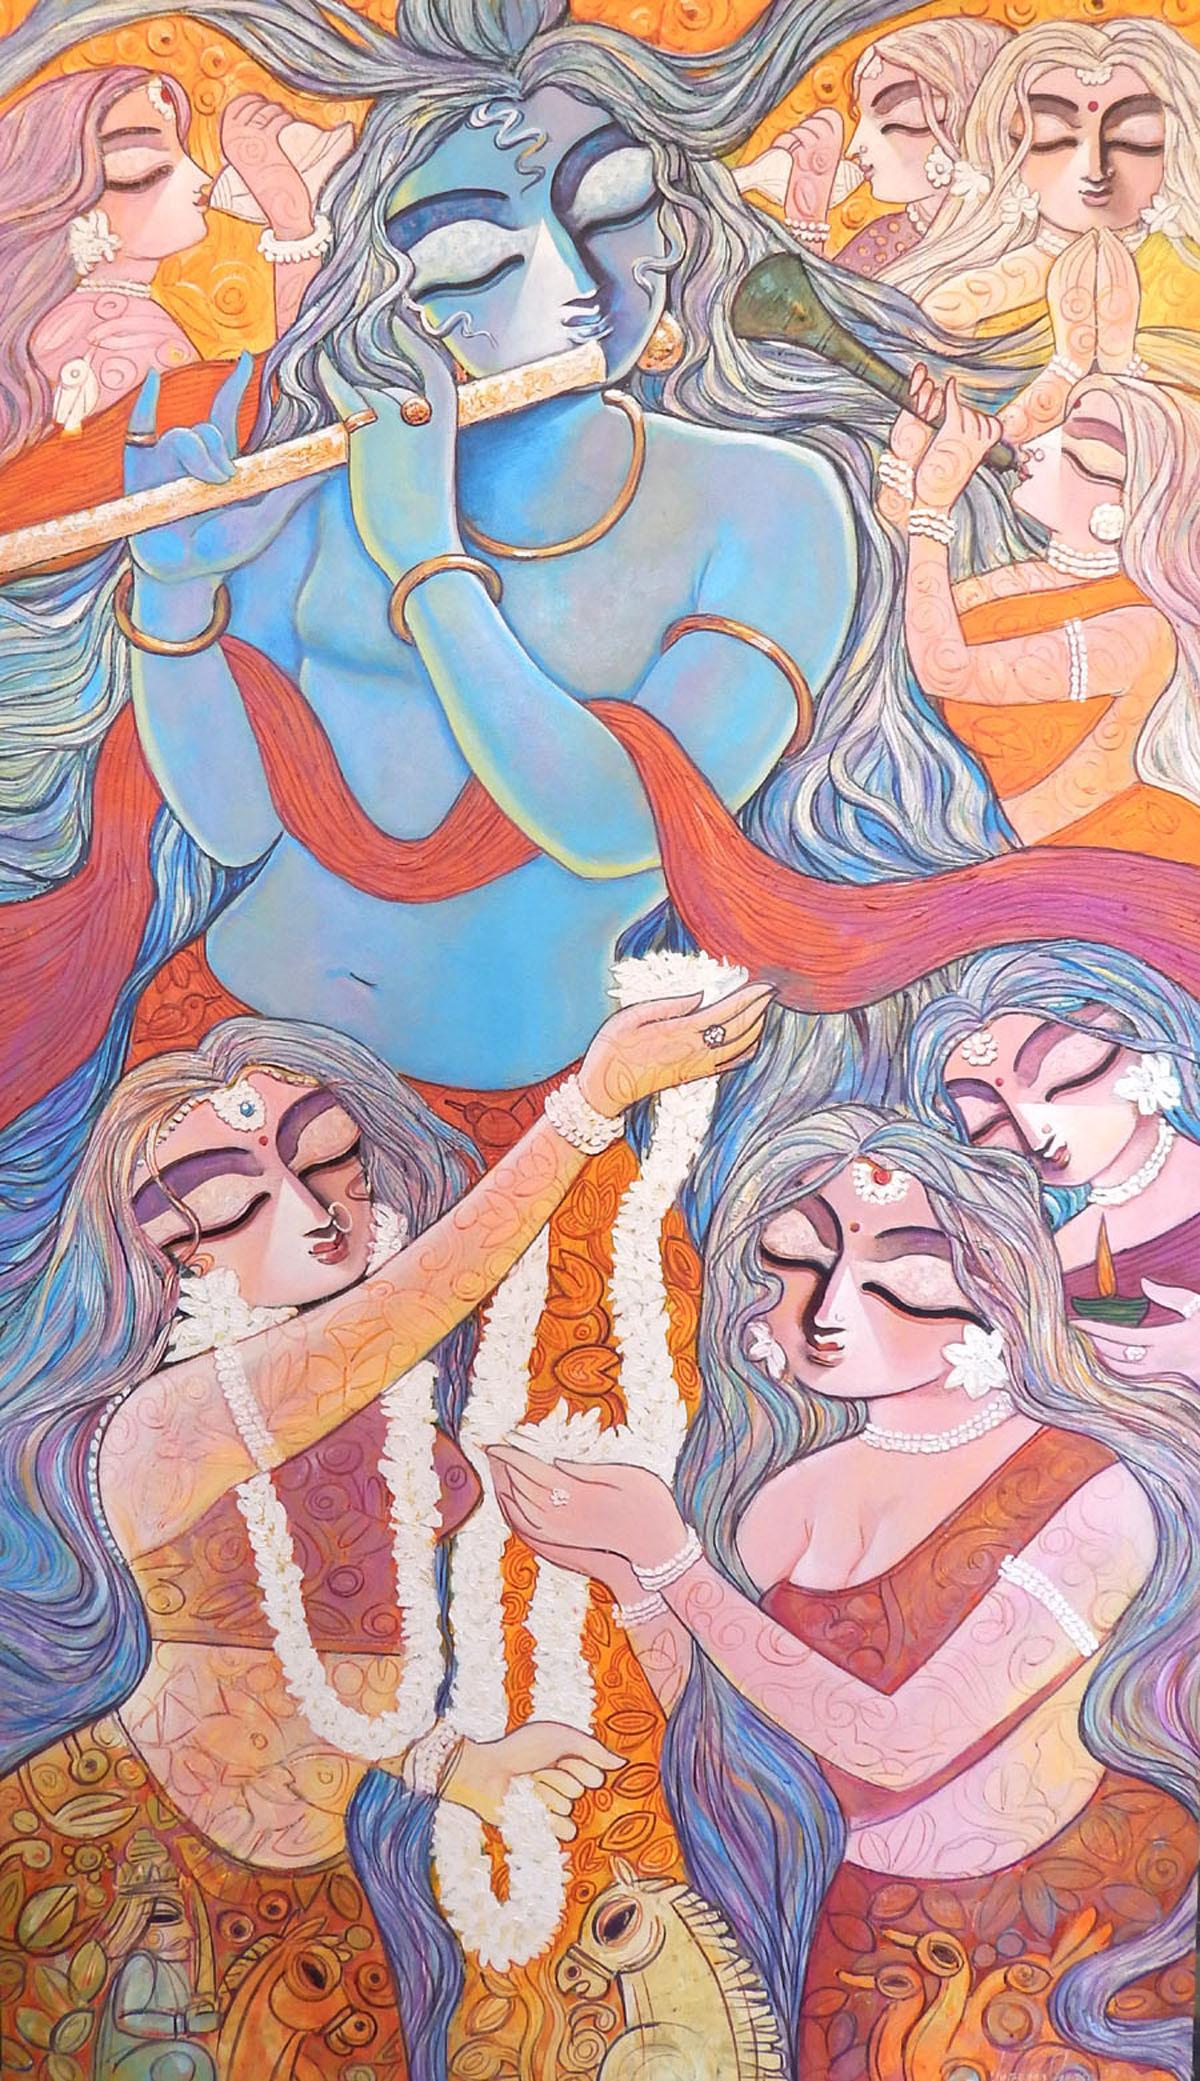 Manohara  size  39 x 67 inch  acrylic on canvas 2017